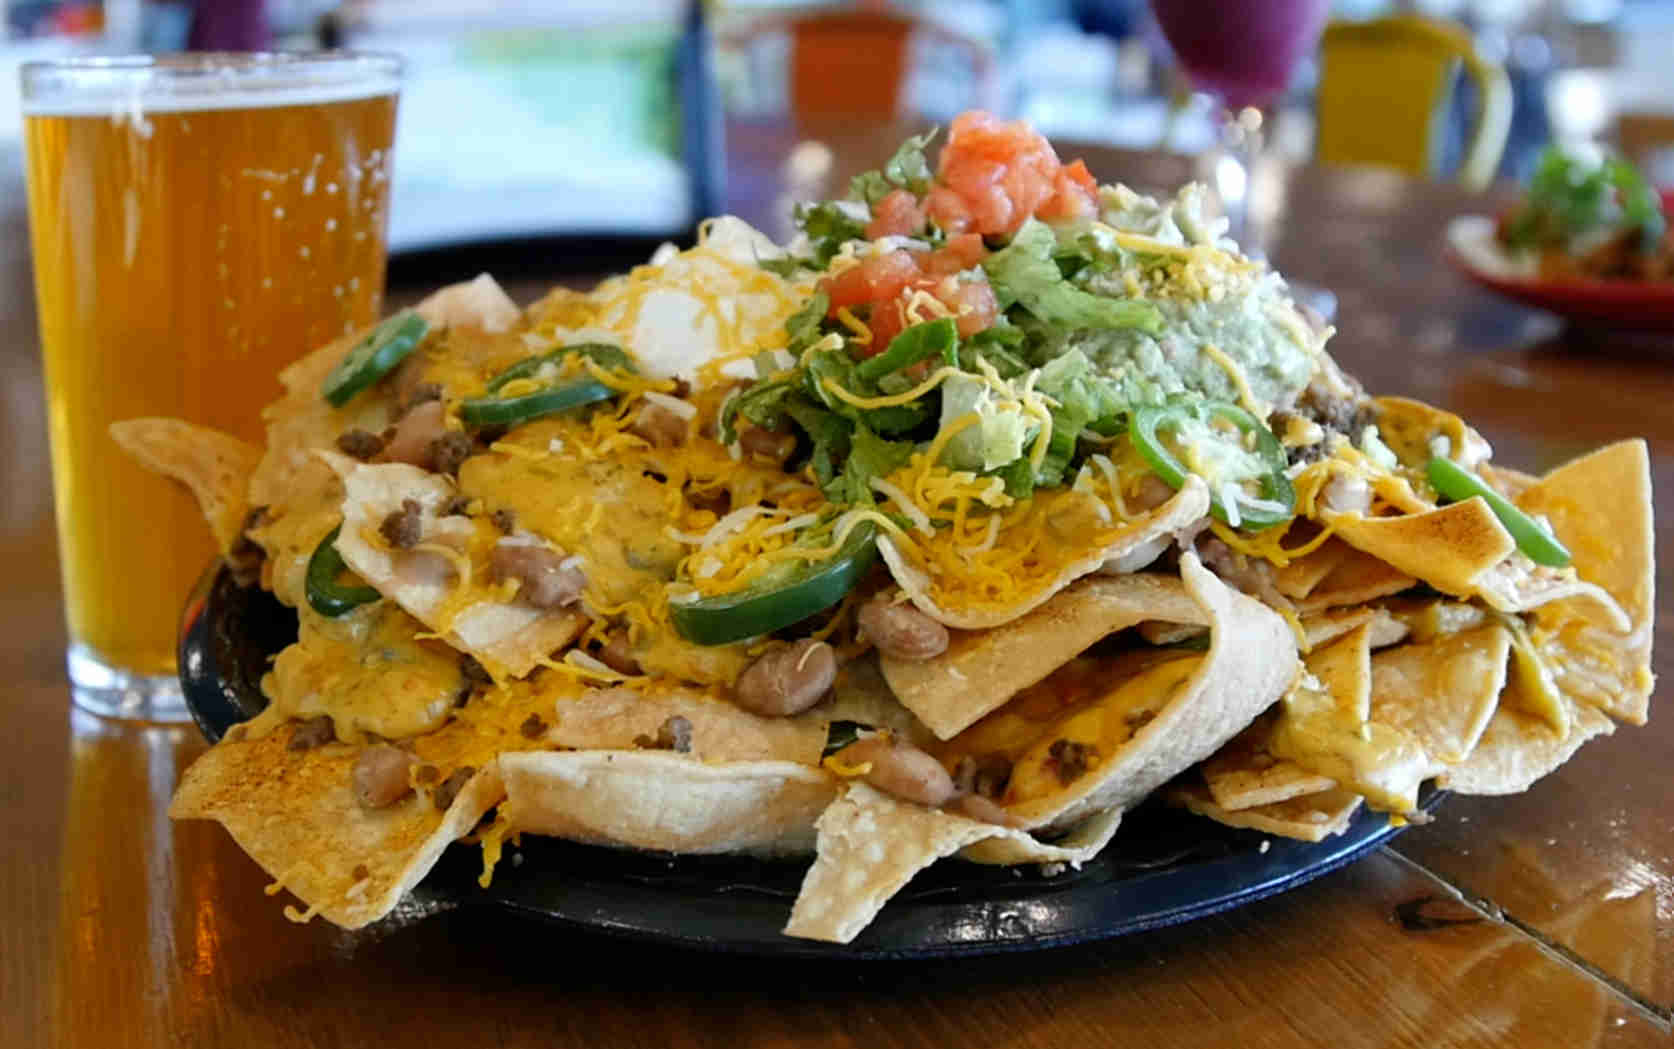 beer and beef nachos at Casa Taco in Albuquerque New Mexico